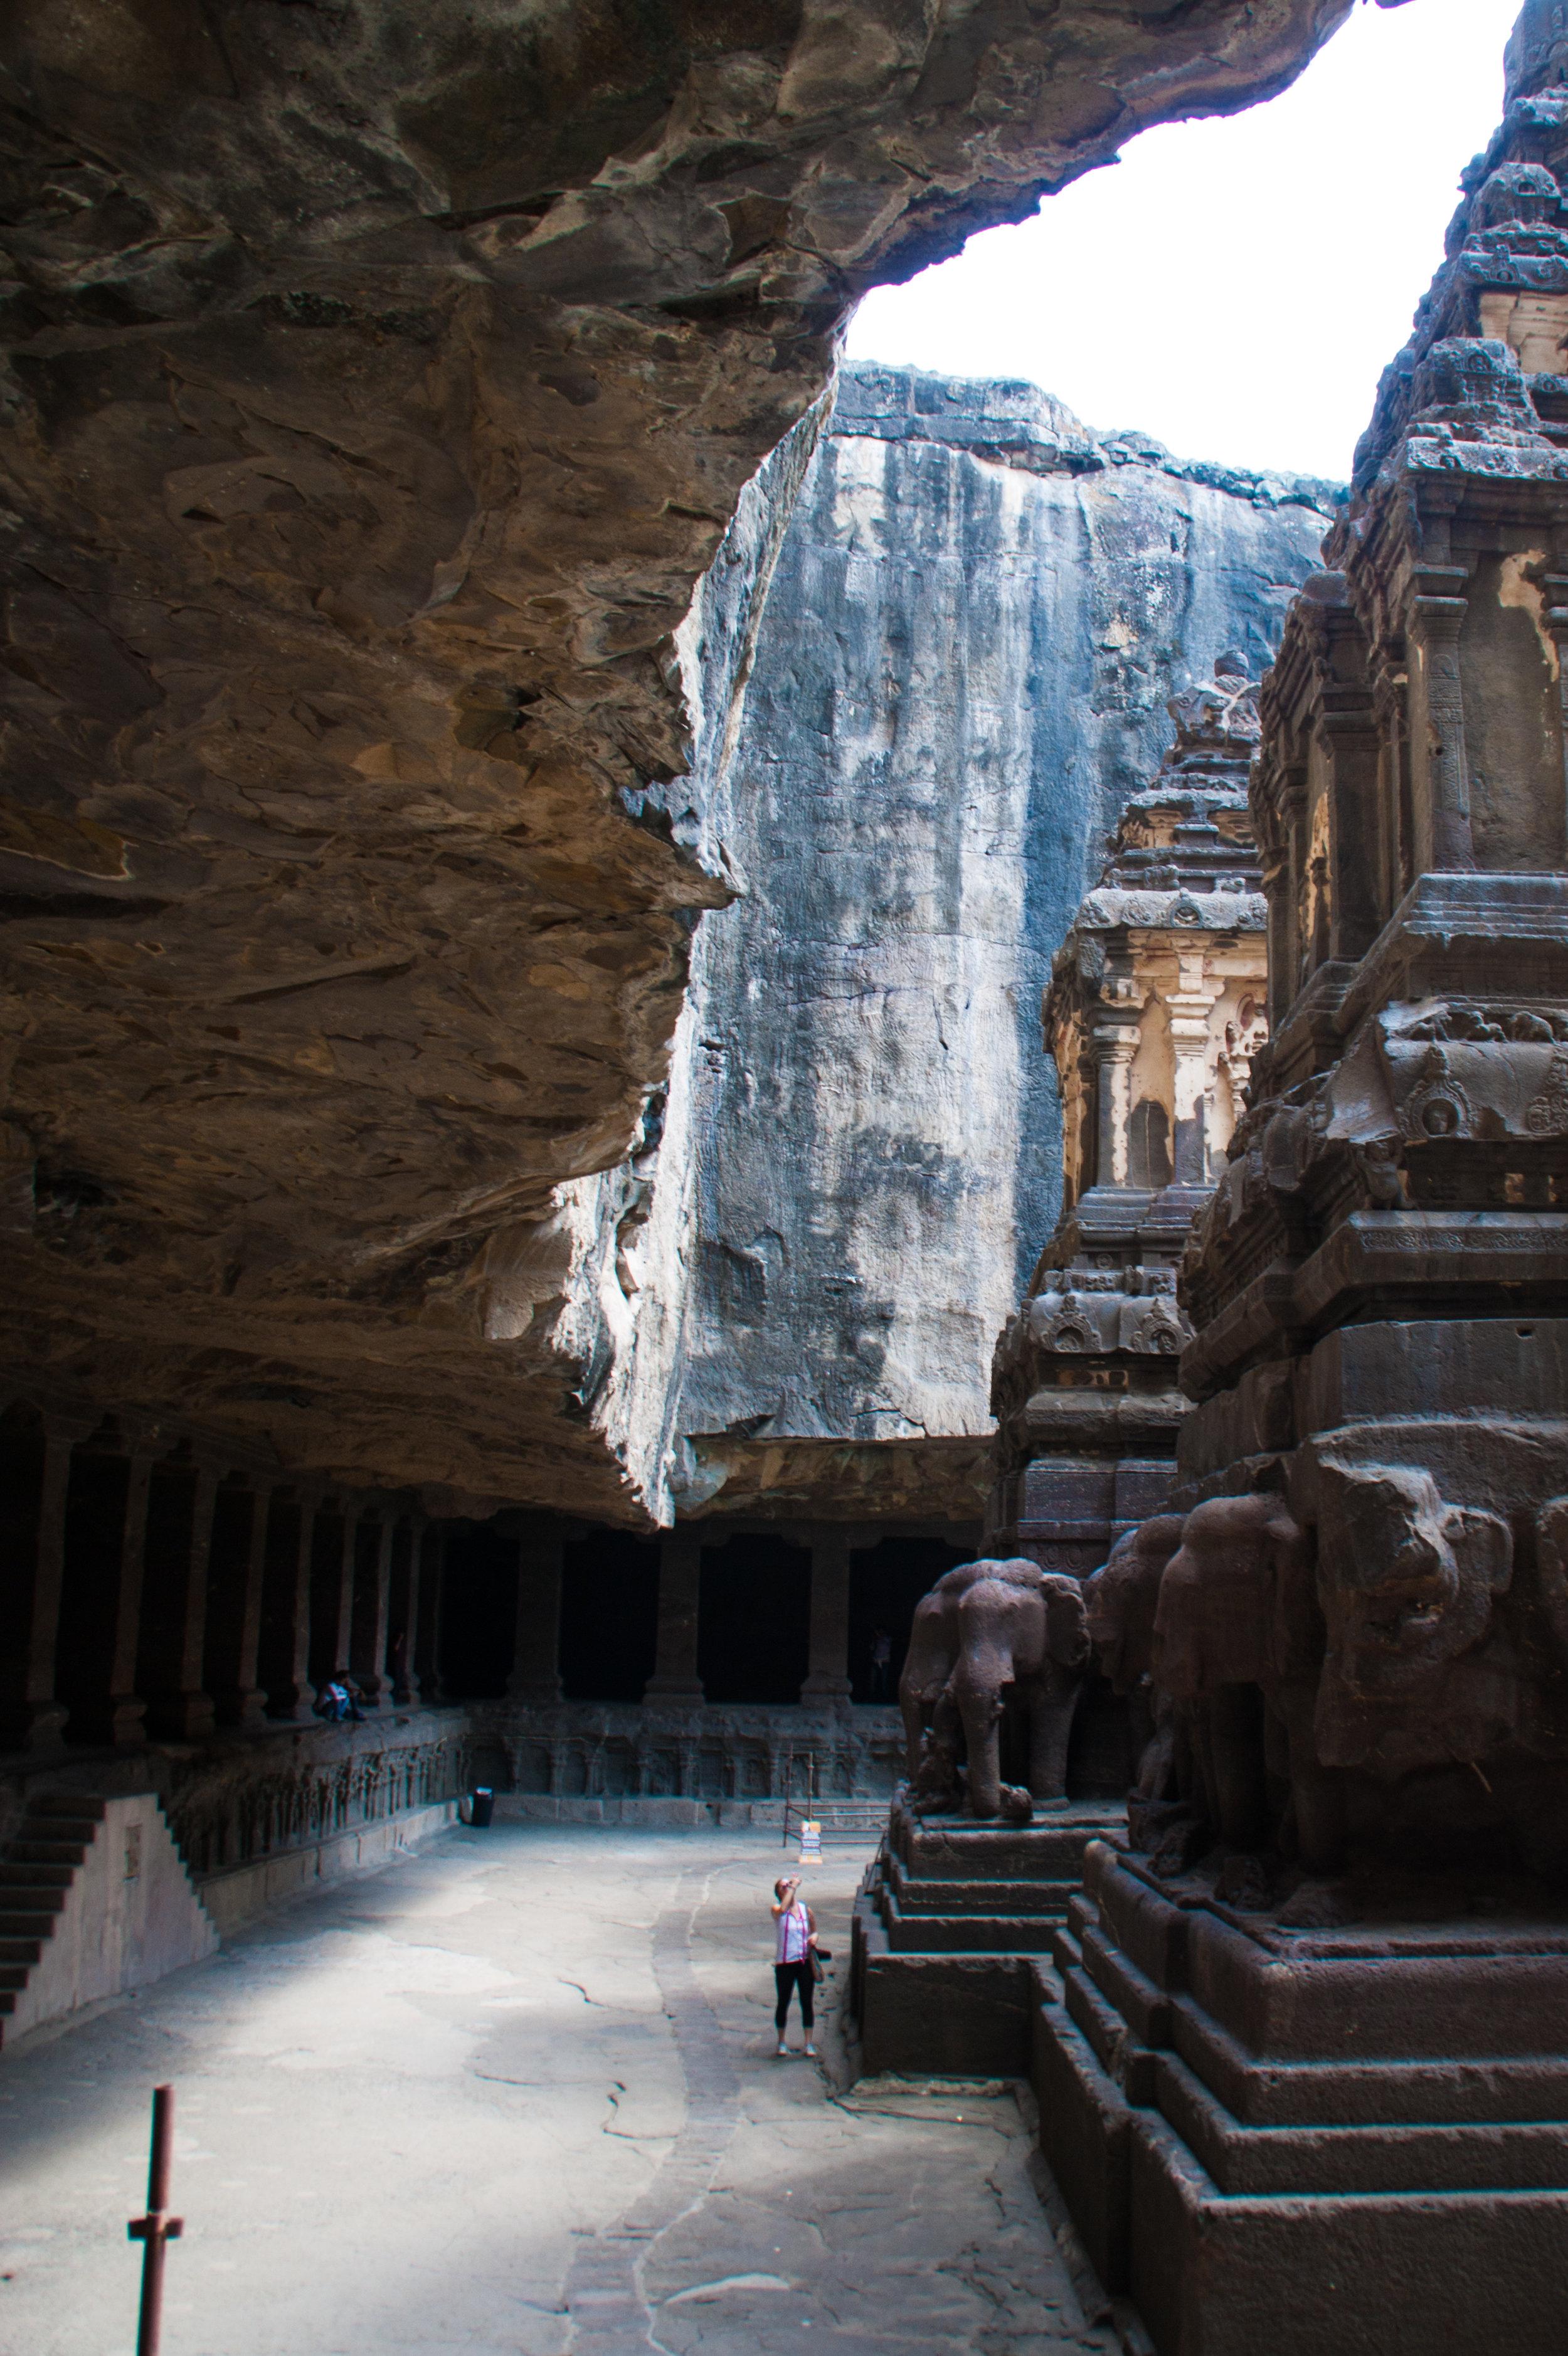 The Ellora Caves in Aurangabad, Maharashtra, India.